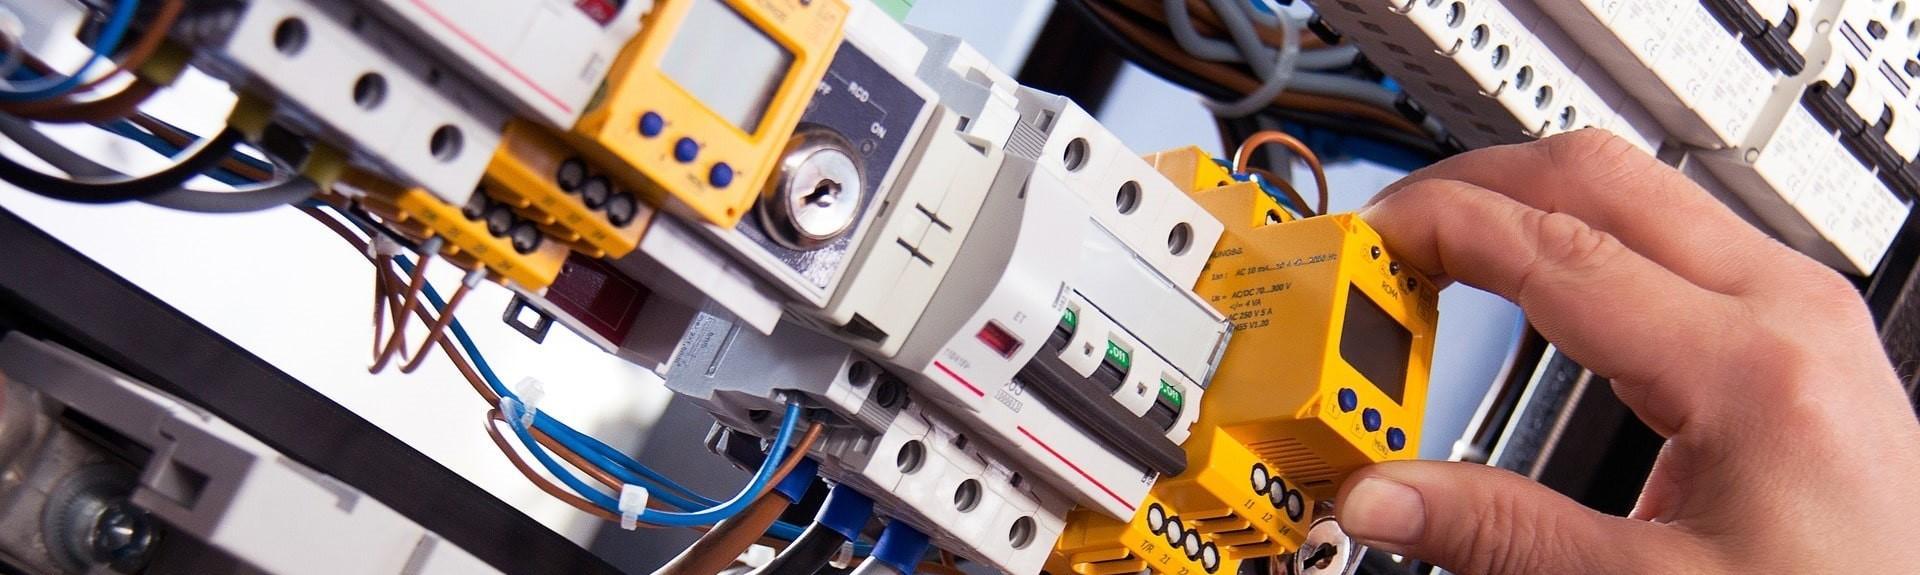 Adeptelec - électricien - wazaa